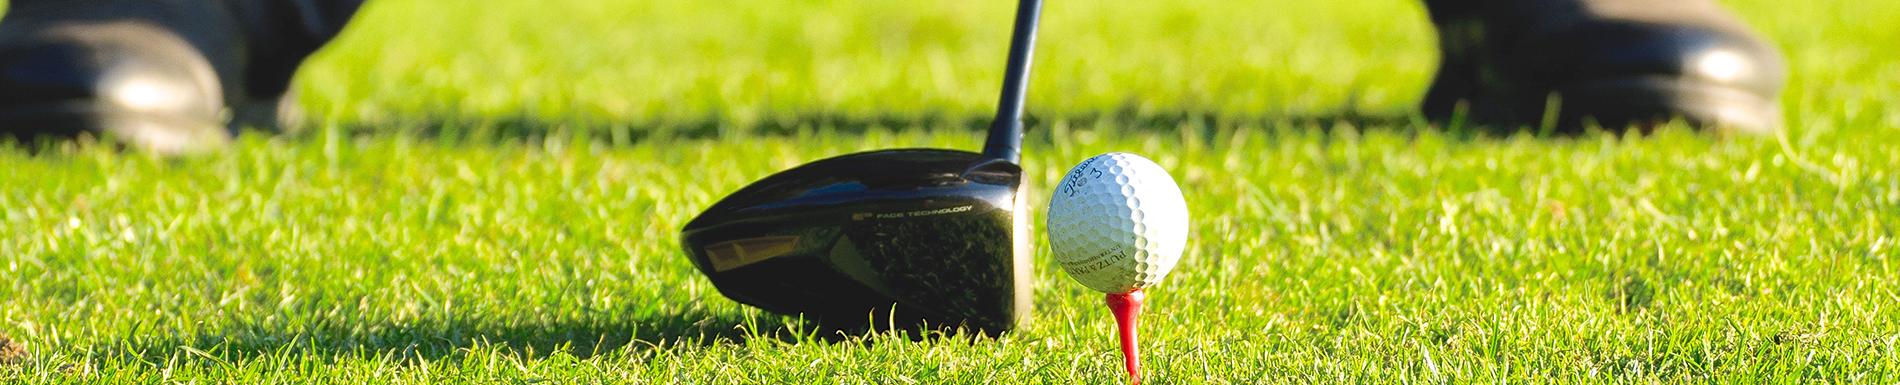 20130906_golfclub_worpswede-53-header